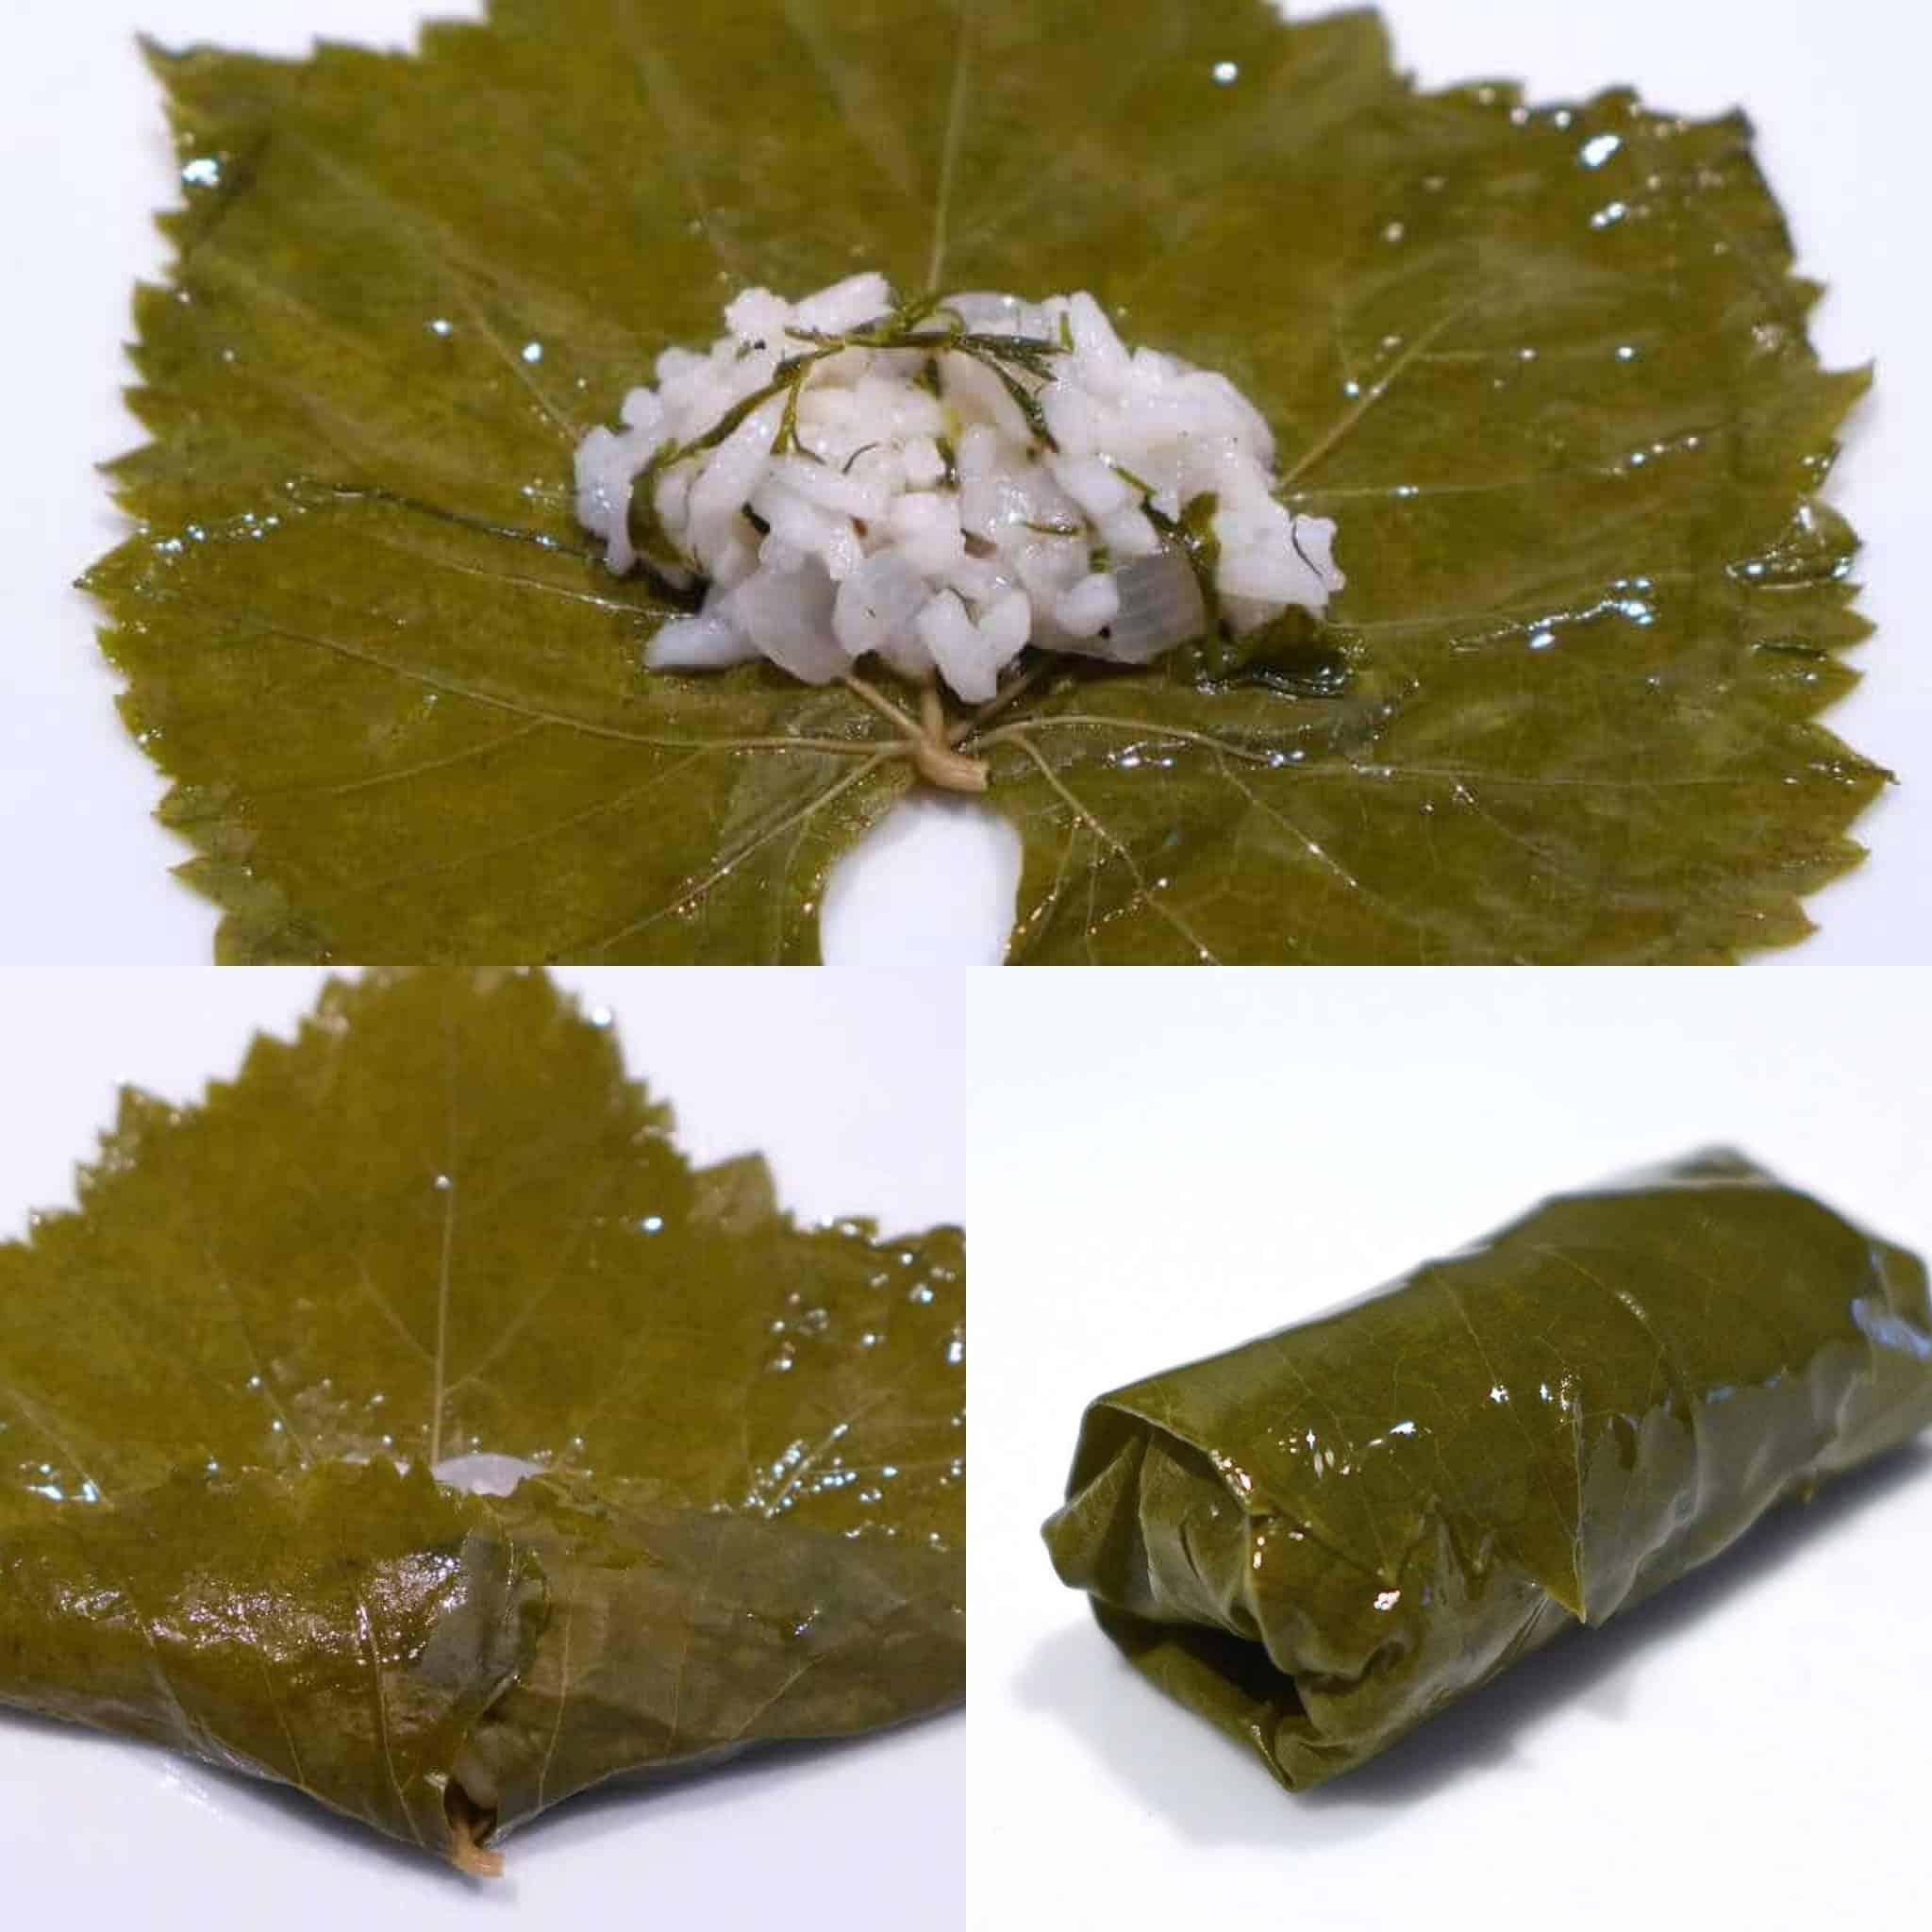 Greek Dolmades preparation (Stuffed Grape Leaves)